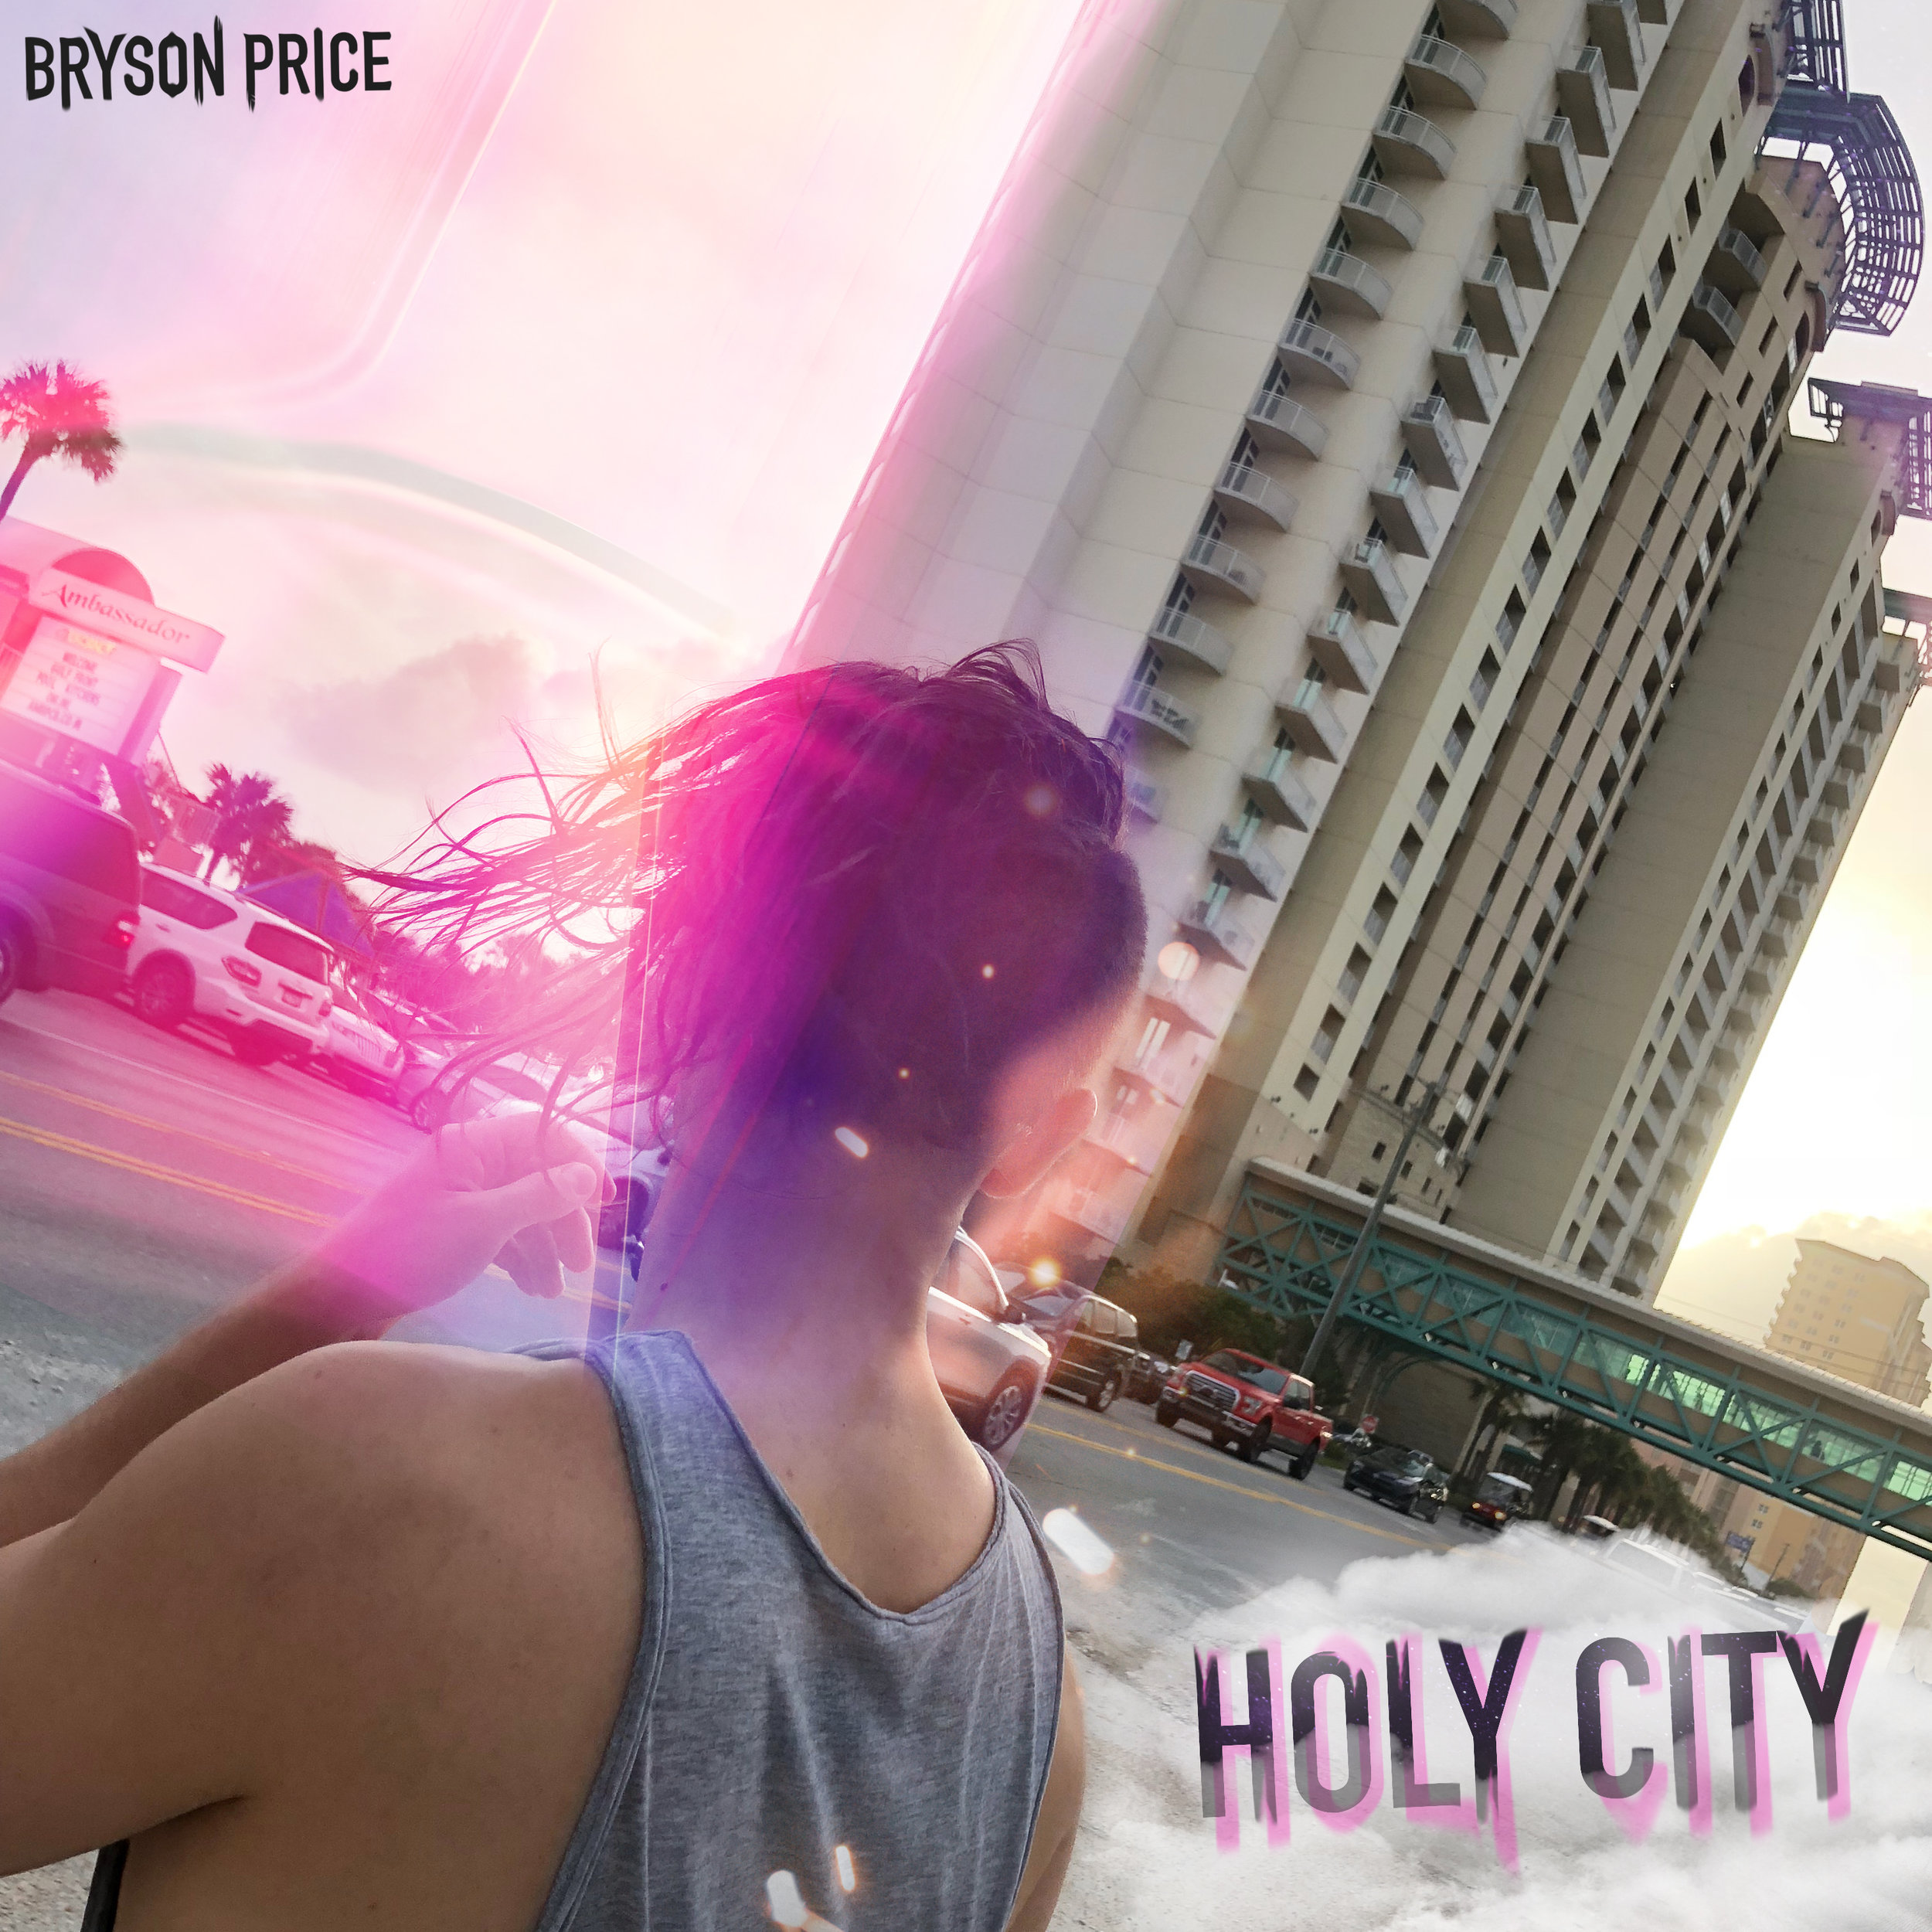 HOLY CITY square art.jpg